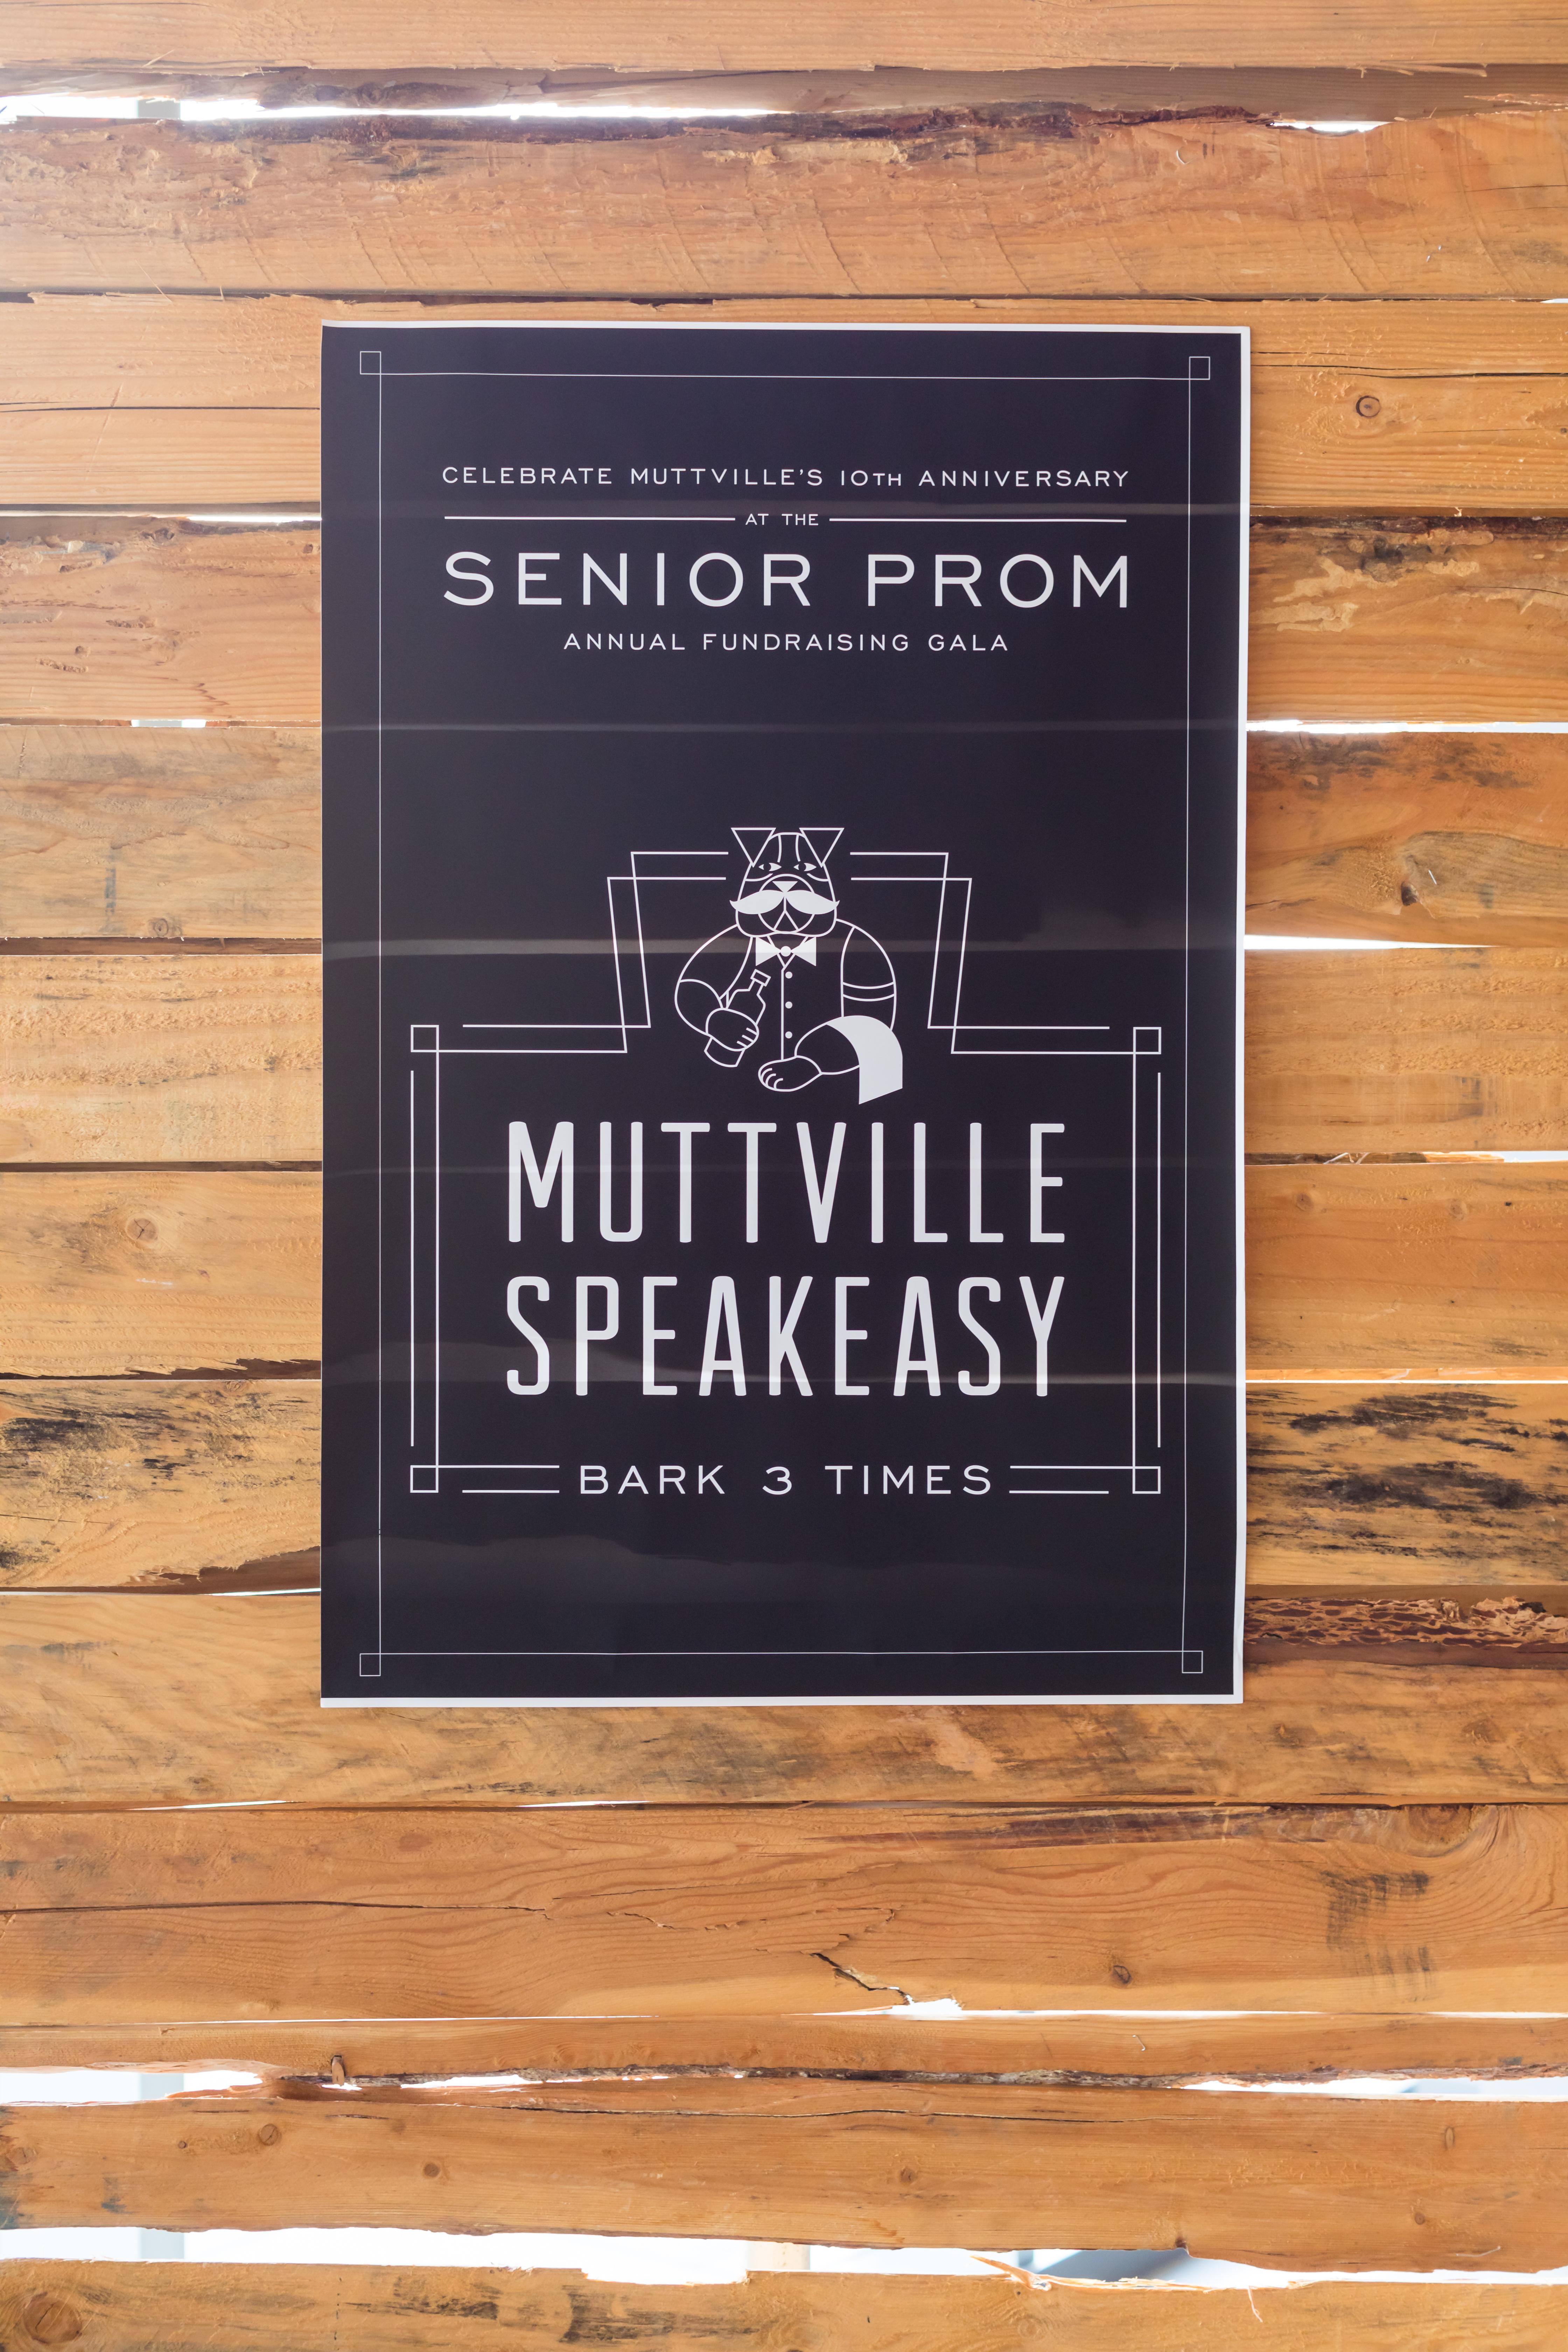 Muttville Speakeasy Senior Prom - All Set